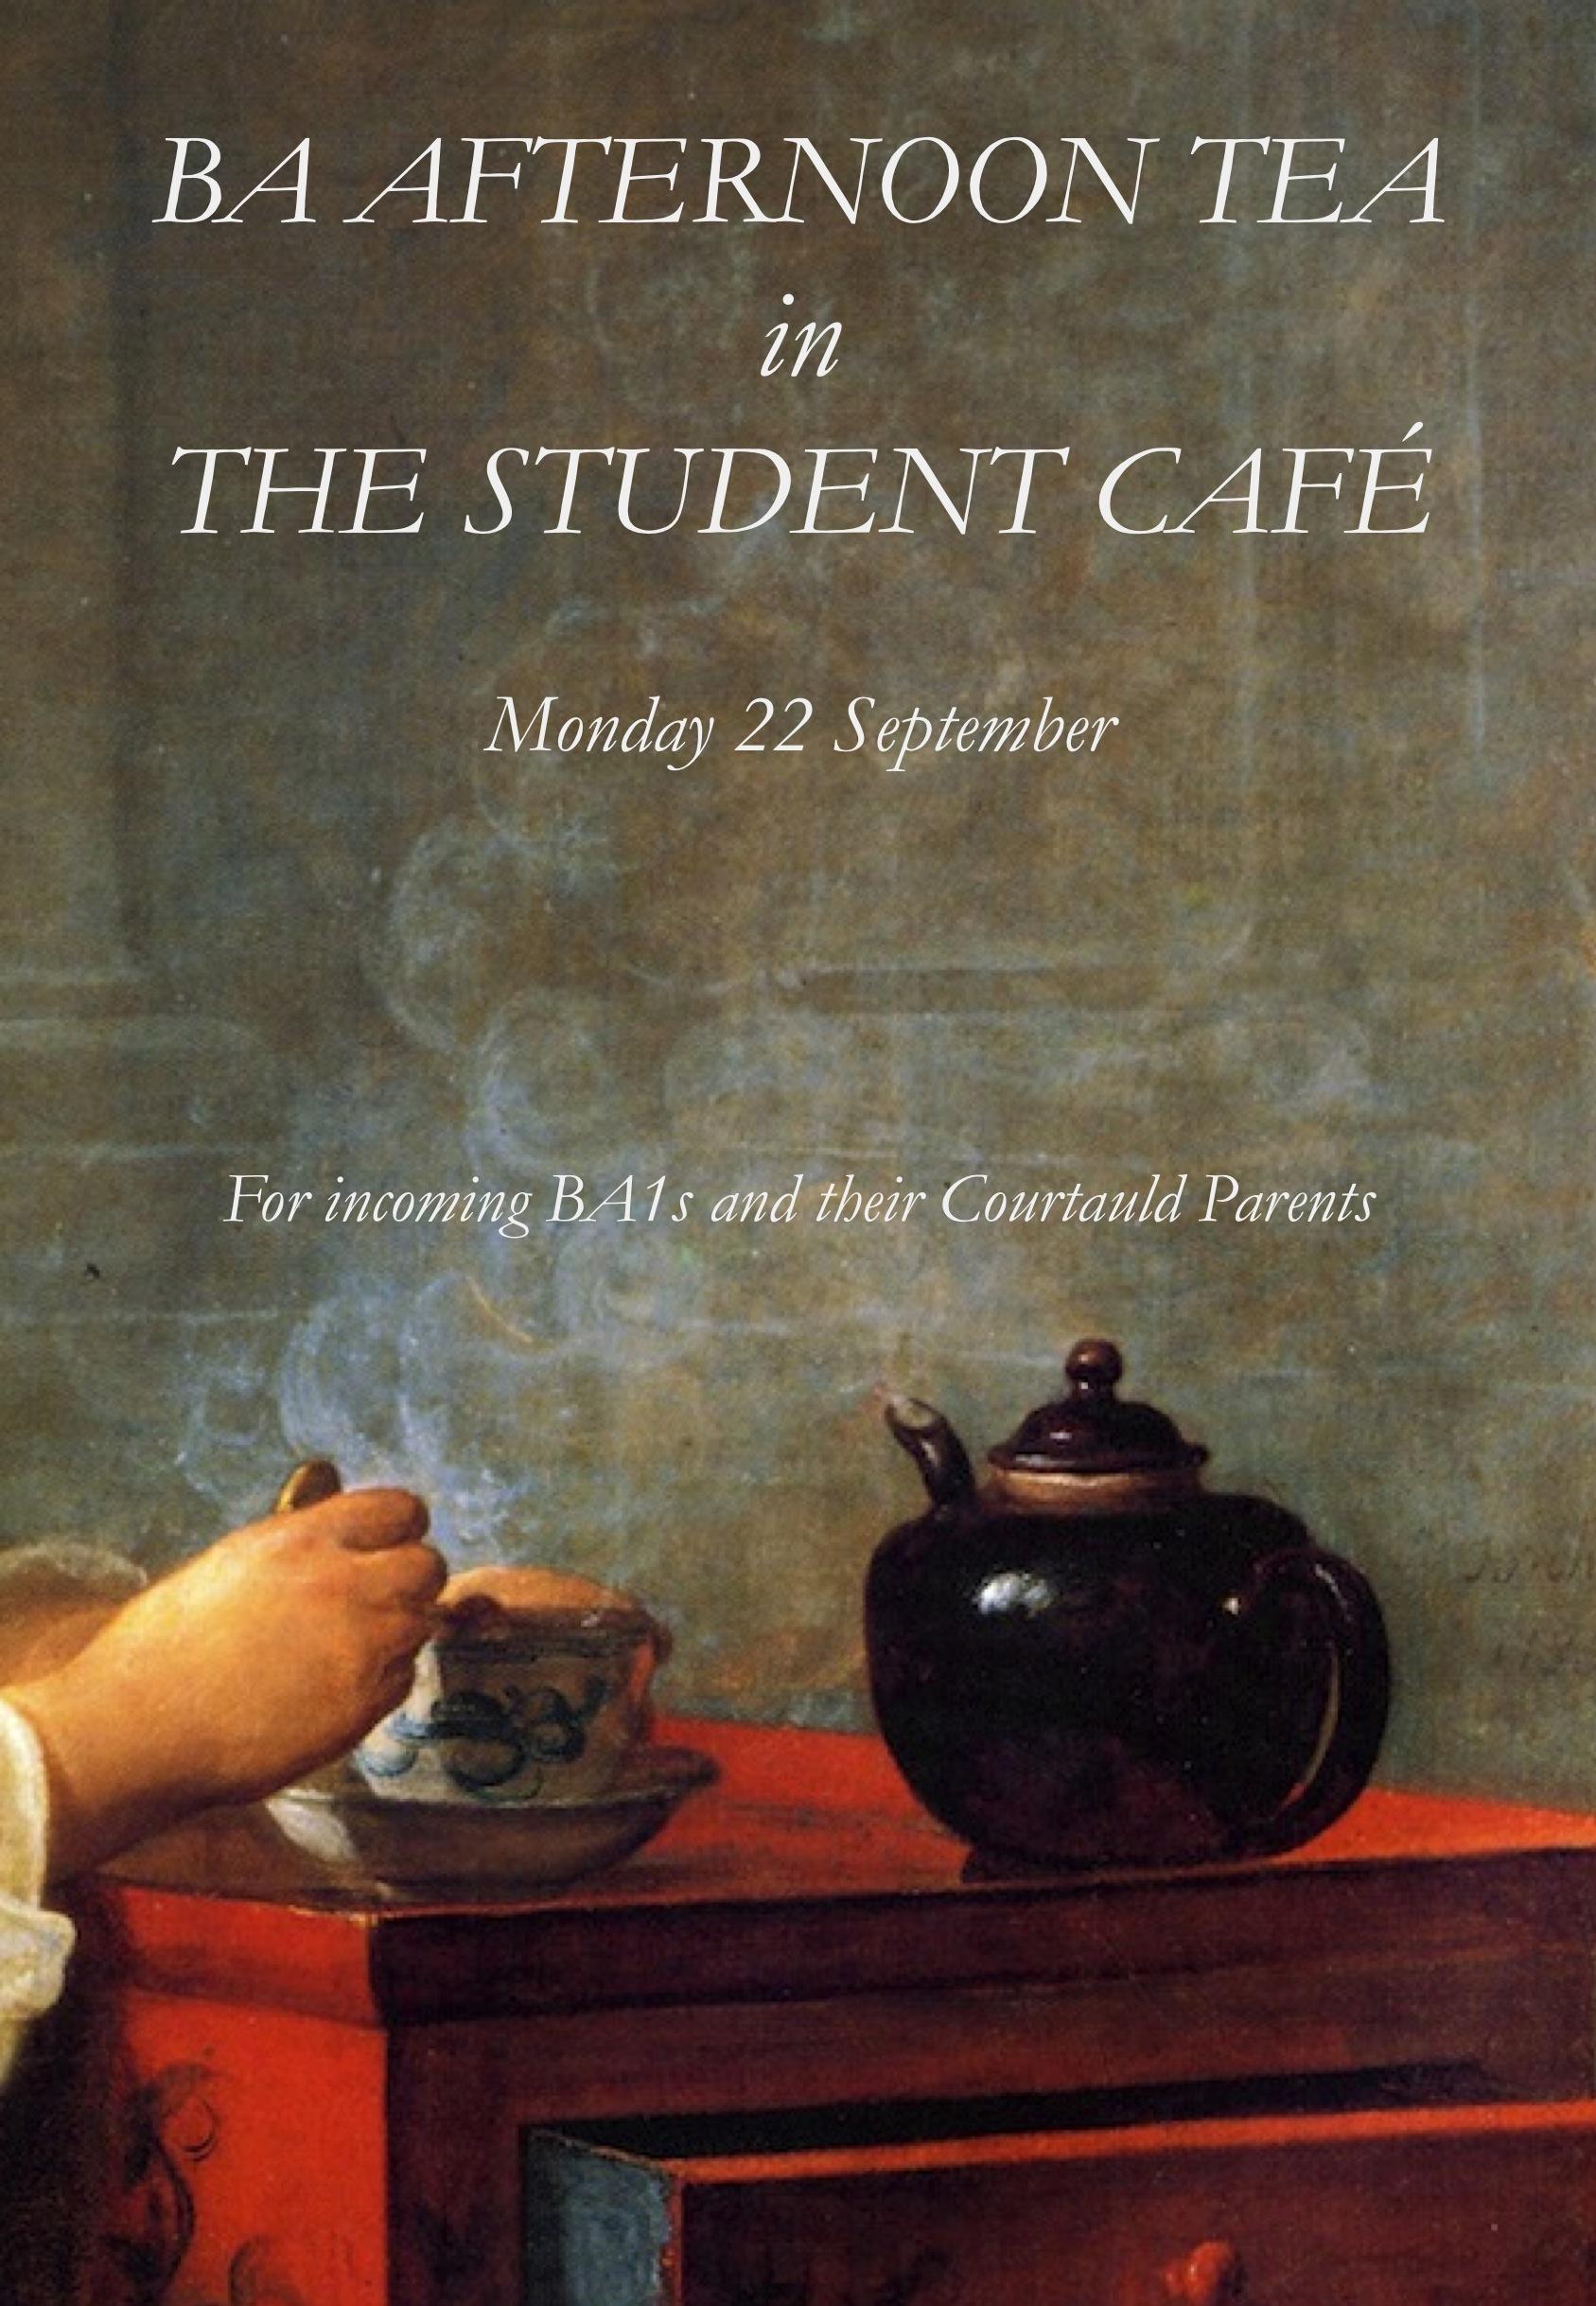 1 Monday 3 Afternoon Tea